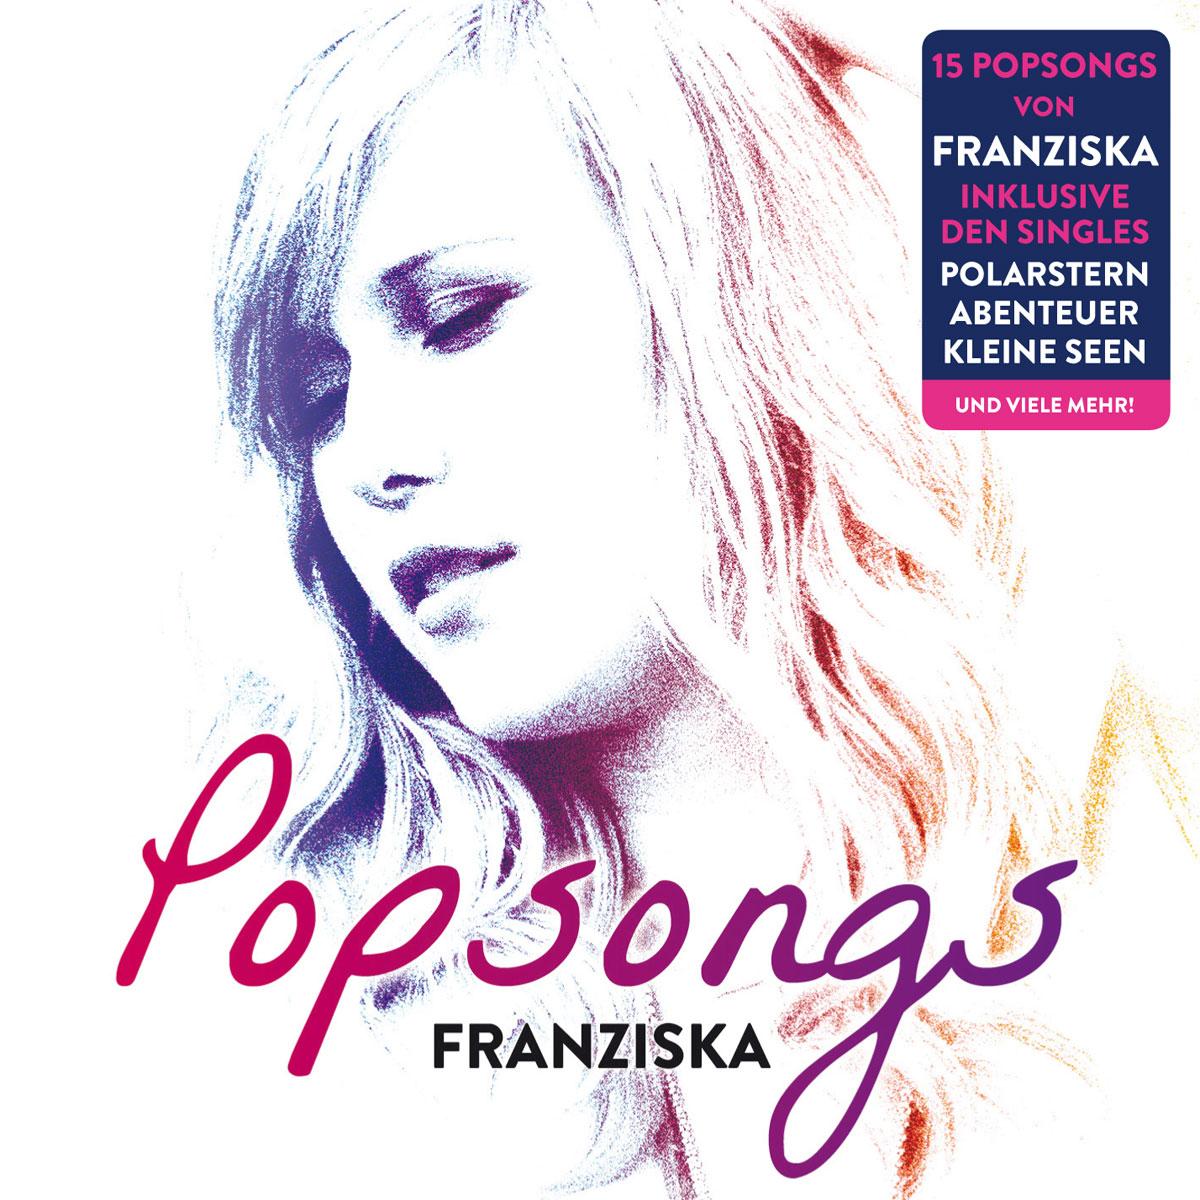 Franziska-Popsongs